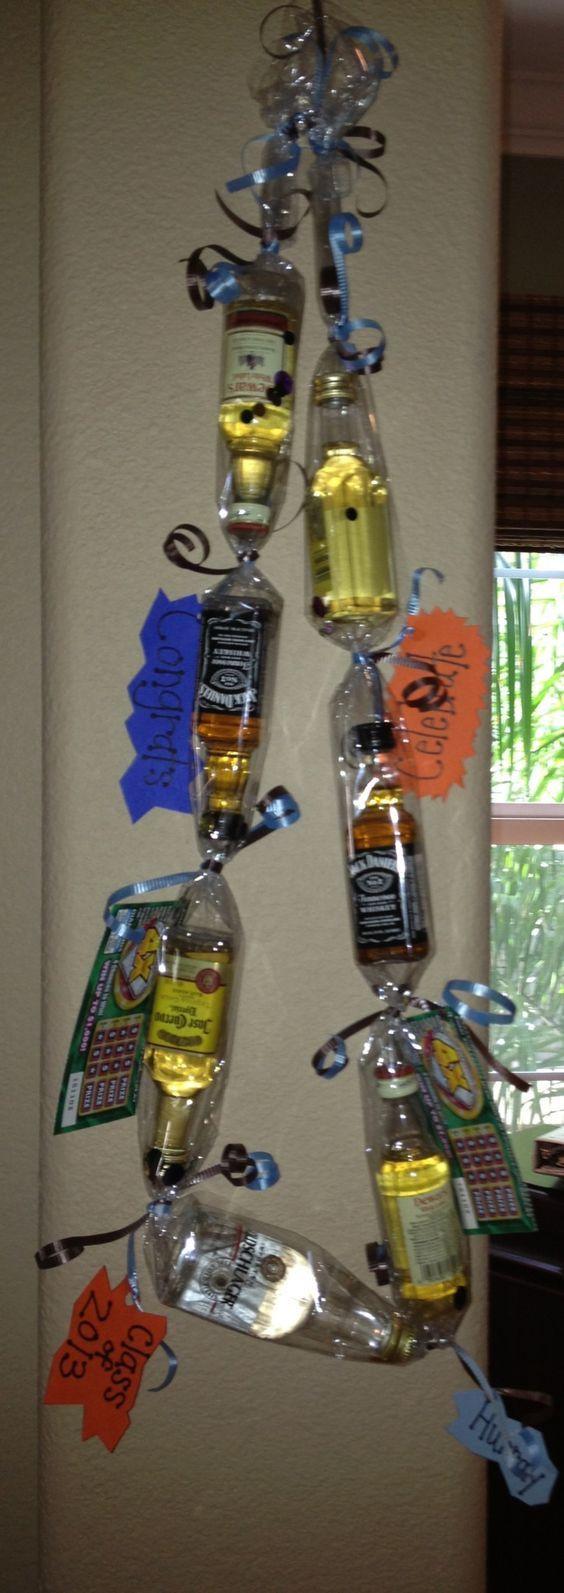 Best ideas about Mini Liquor Bottle Gift Ideas . Save or Pin 25 best Mini Alcohol Bottles ideas on Pinterest Now.